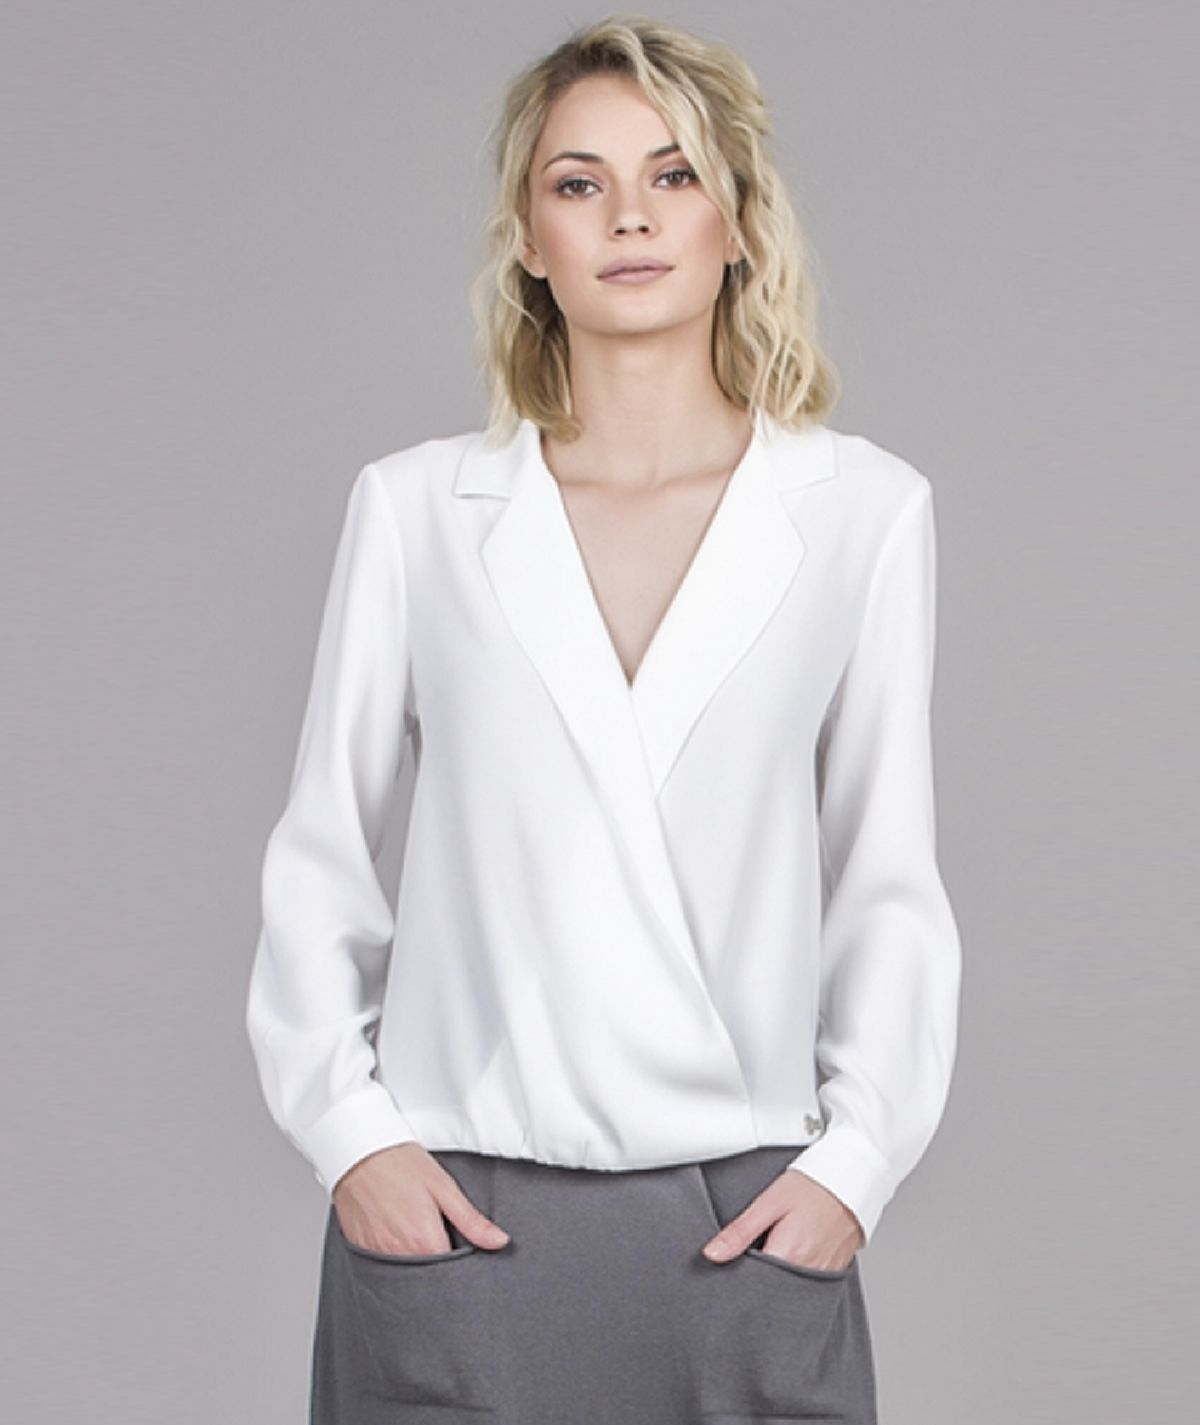 [CHIESSY] Blusa cruzada